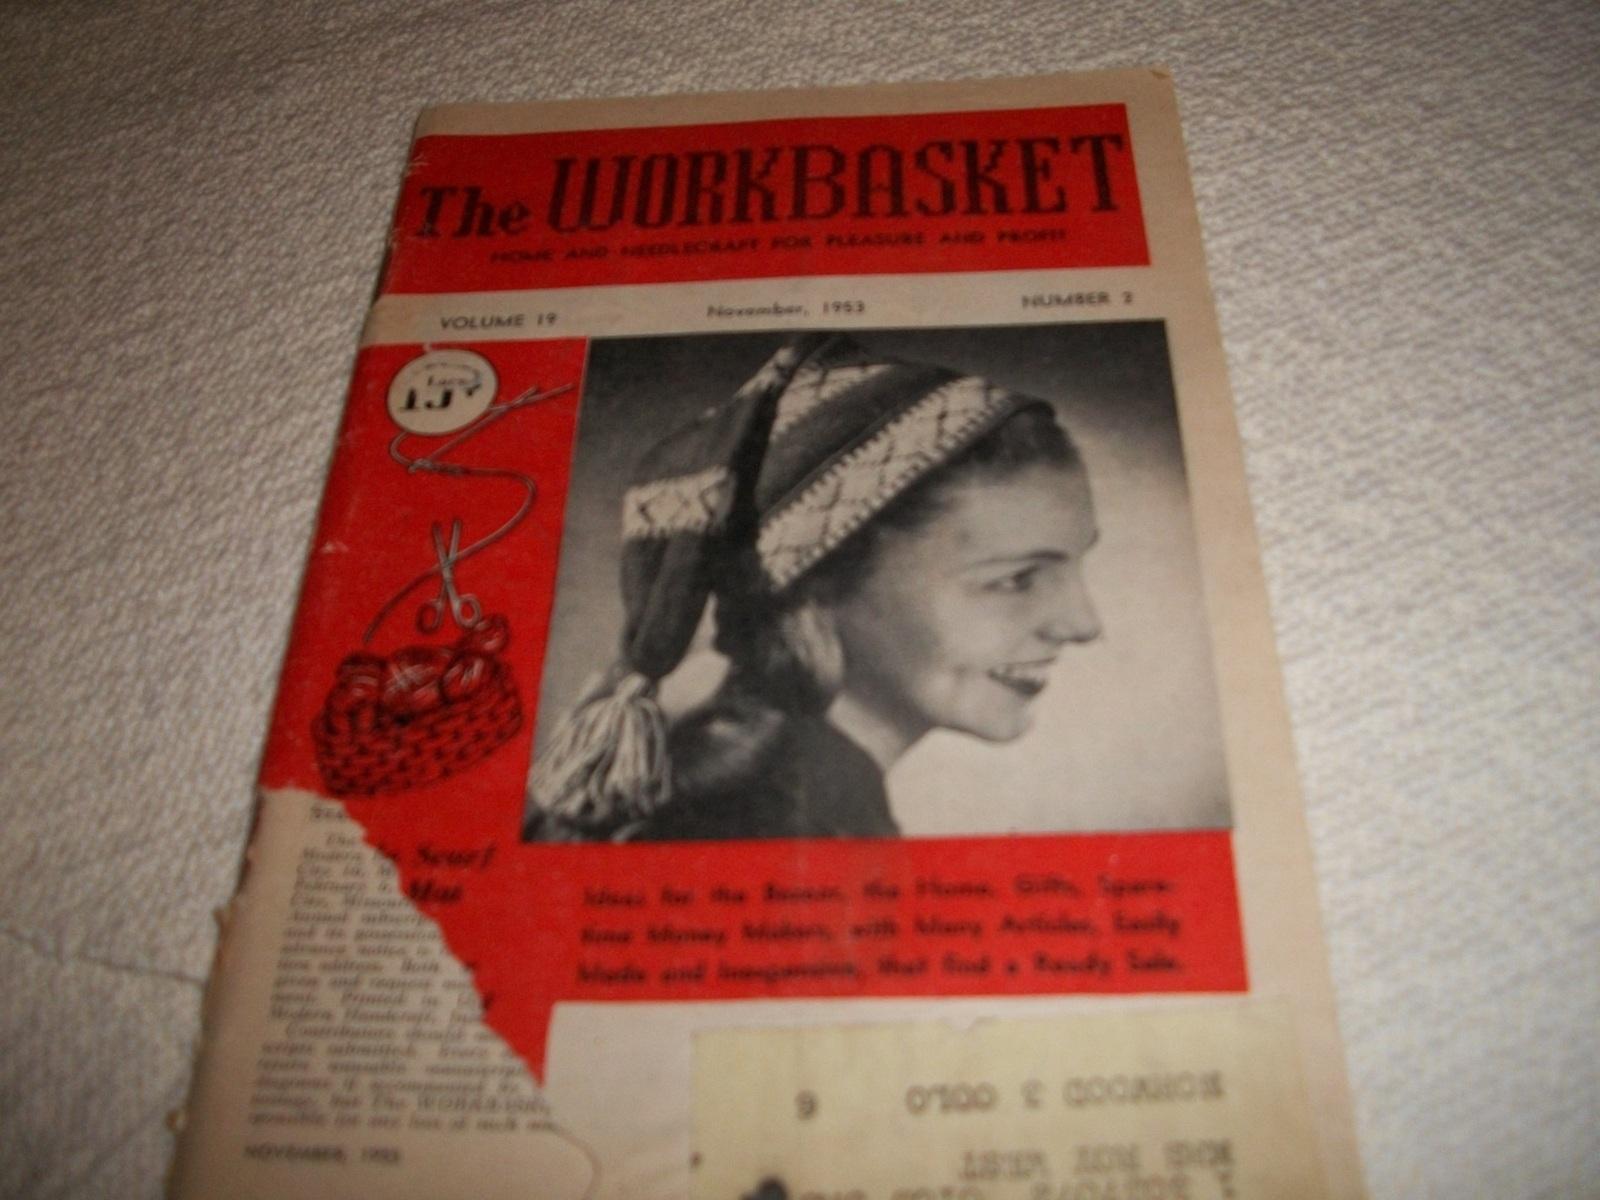 The Workbasket Magazine November 1953 - $5.00